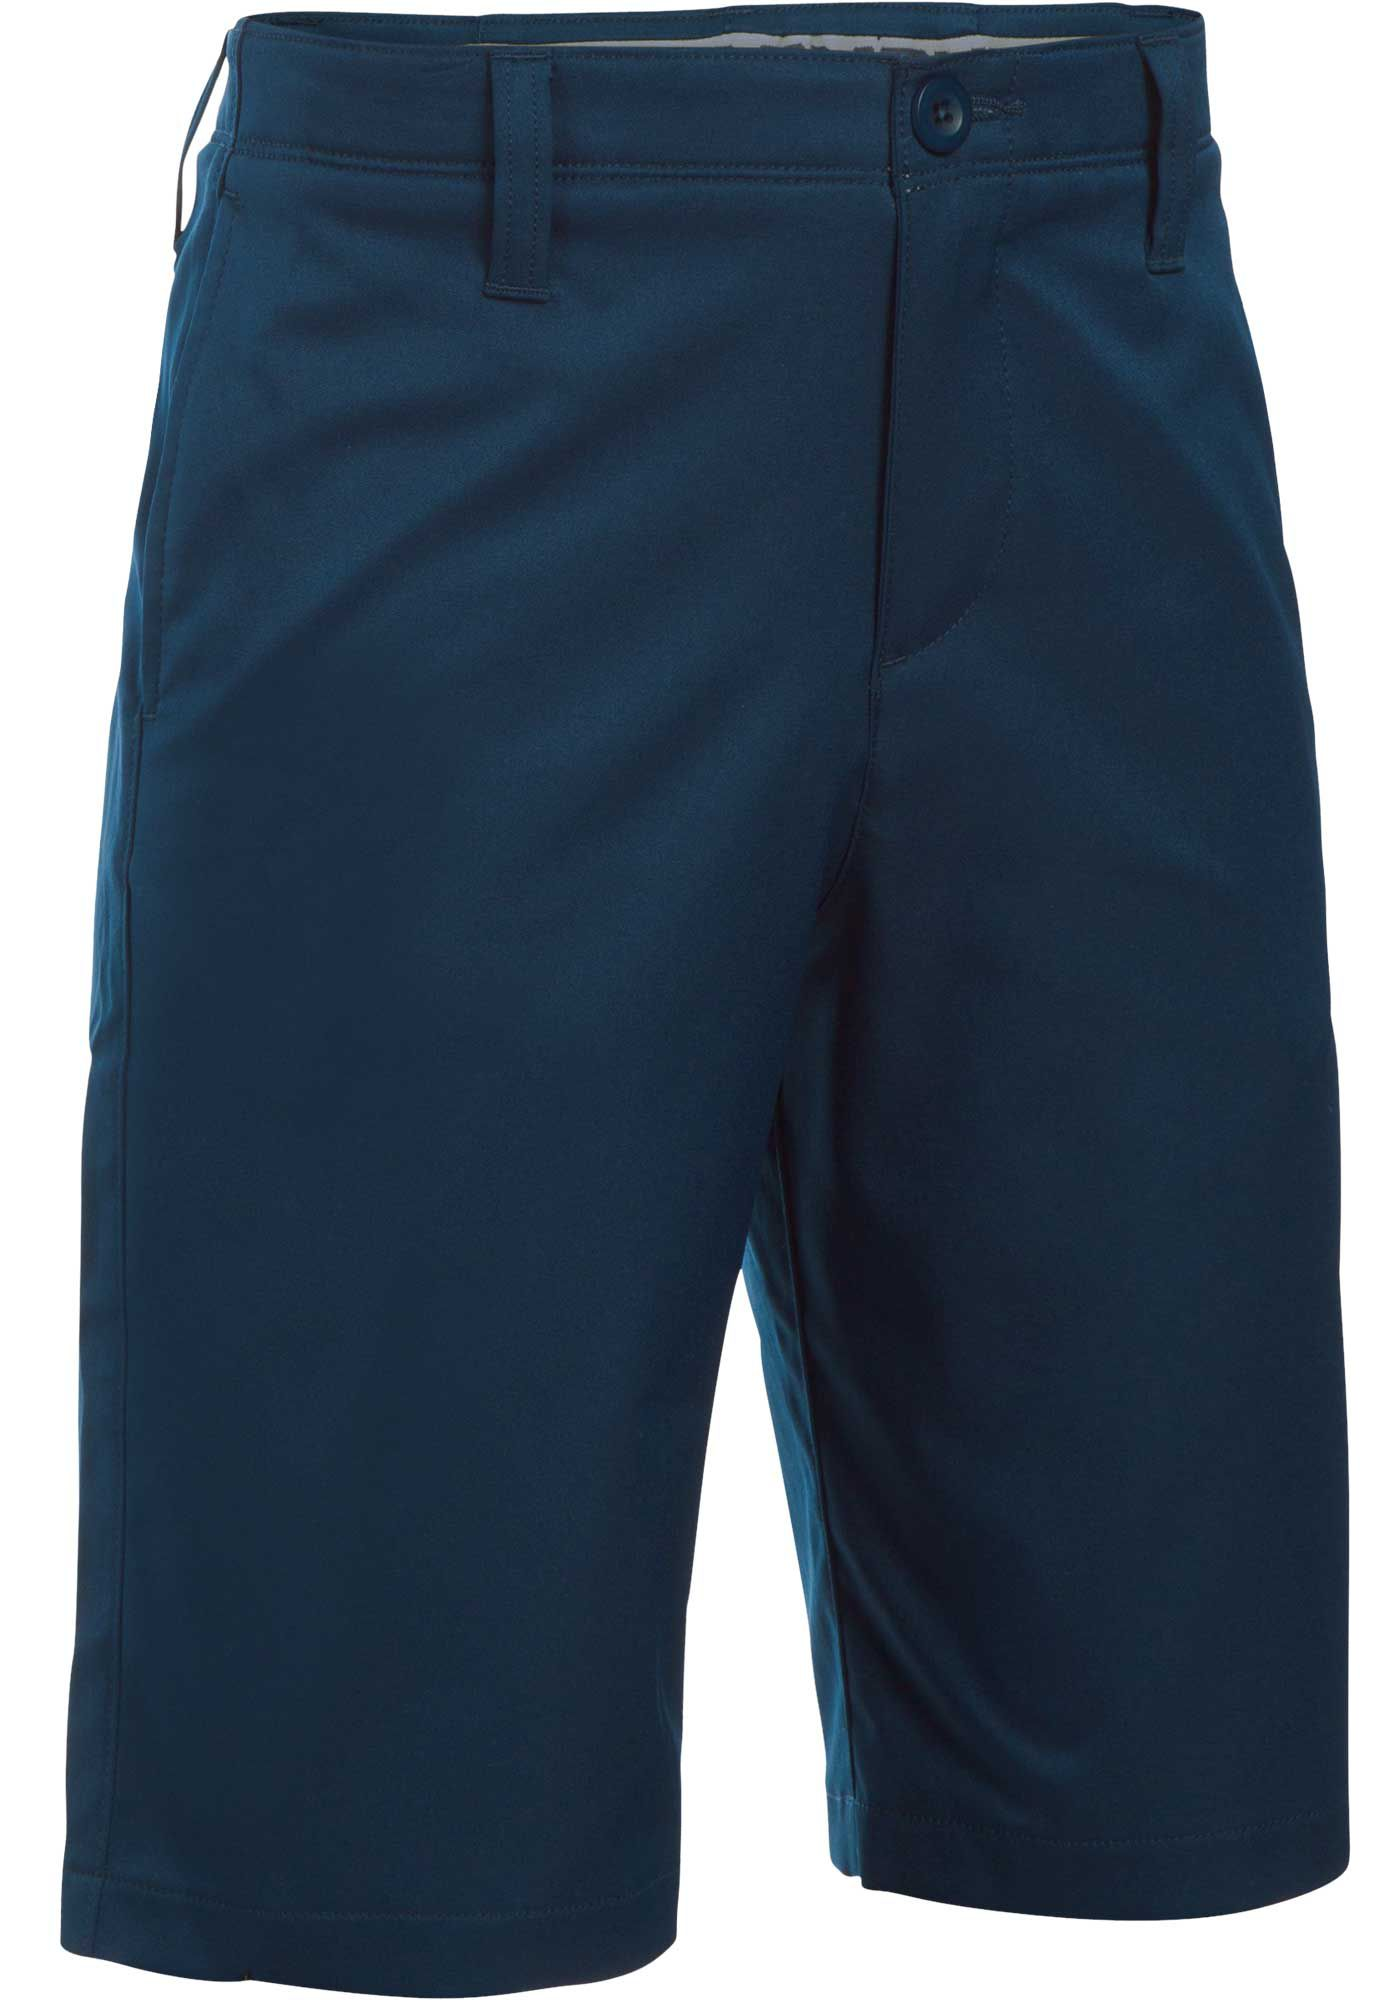 Under Armour Boys' Match Play Golf Shorts